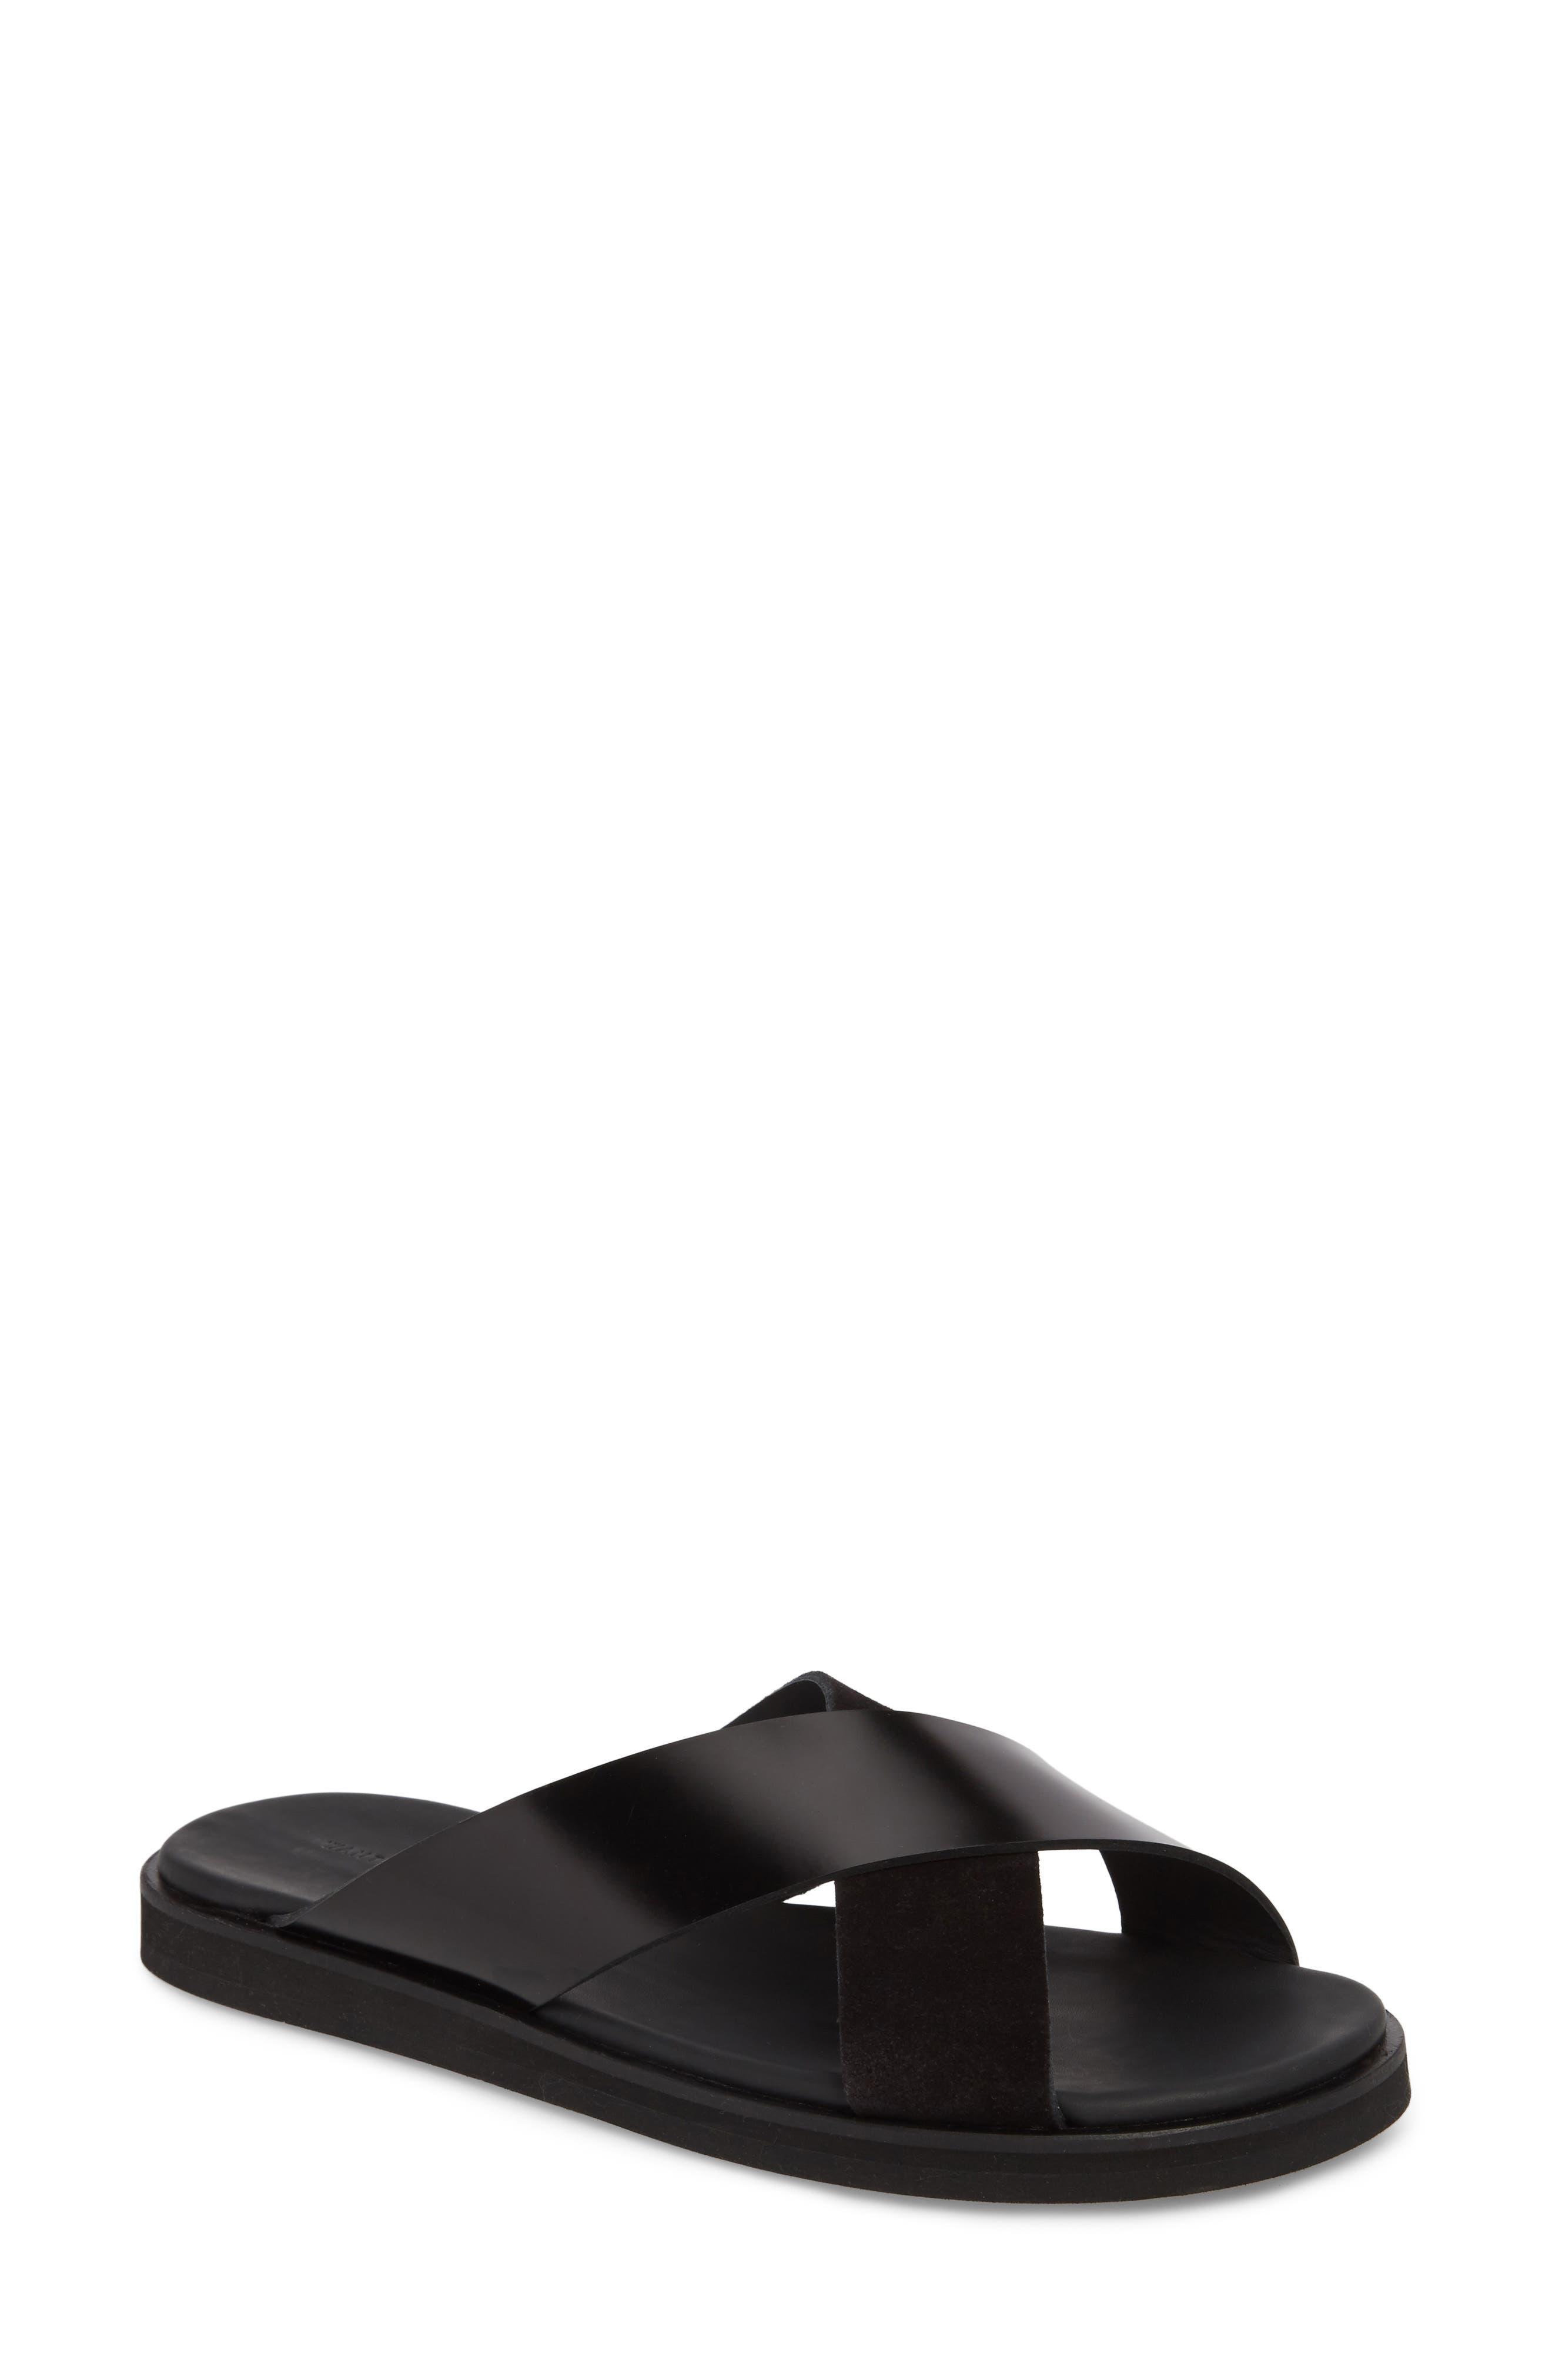 Kavala Slide Sandal,                         Main,                         color, 001